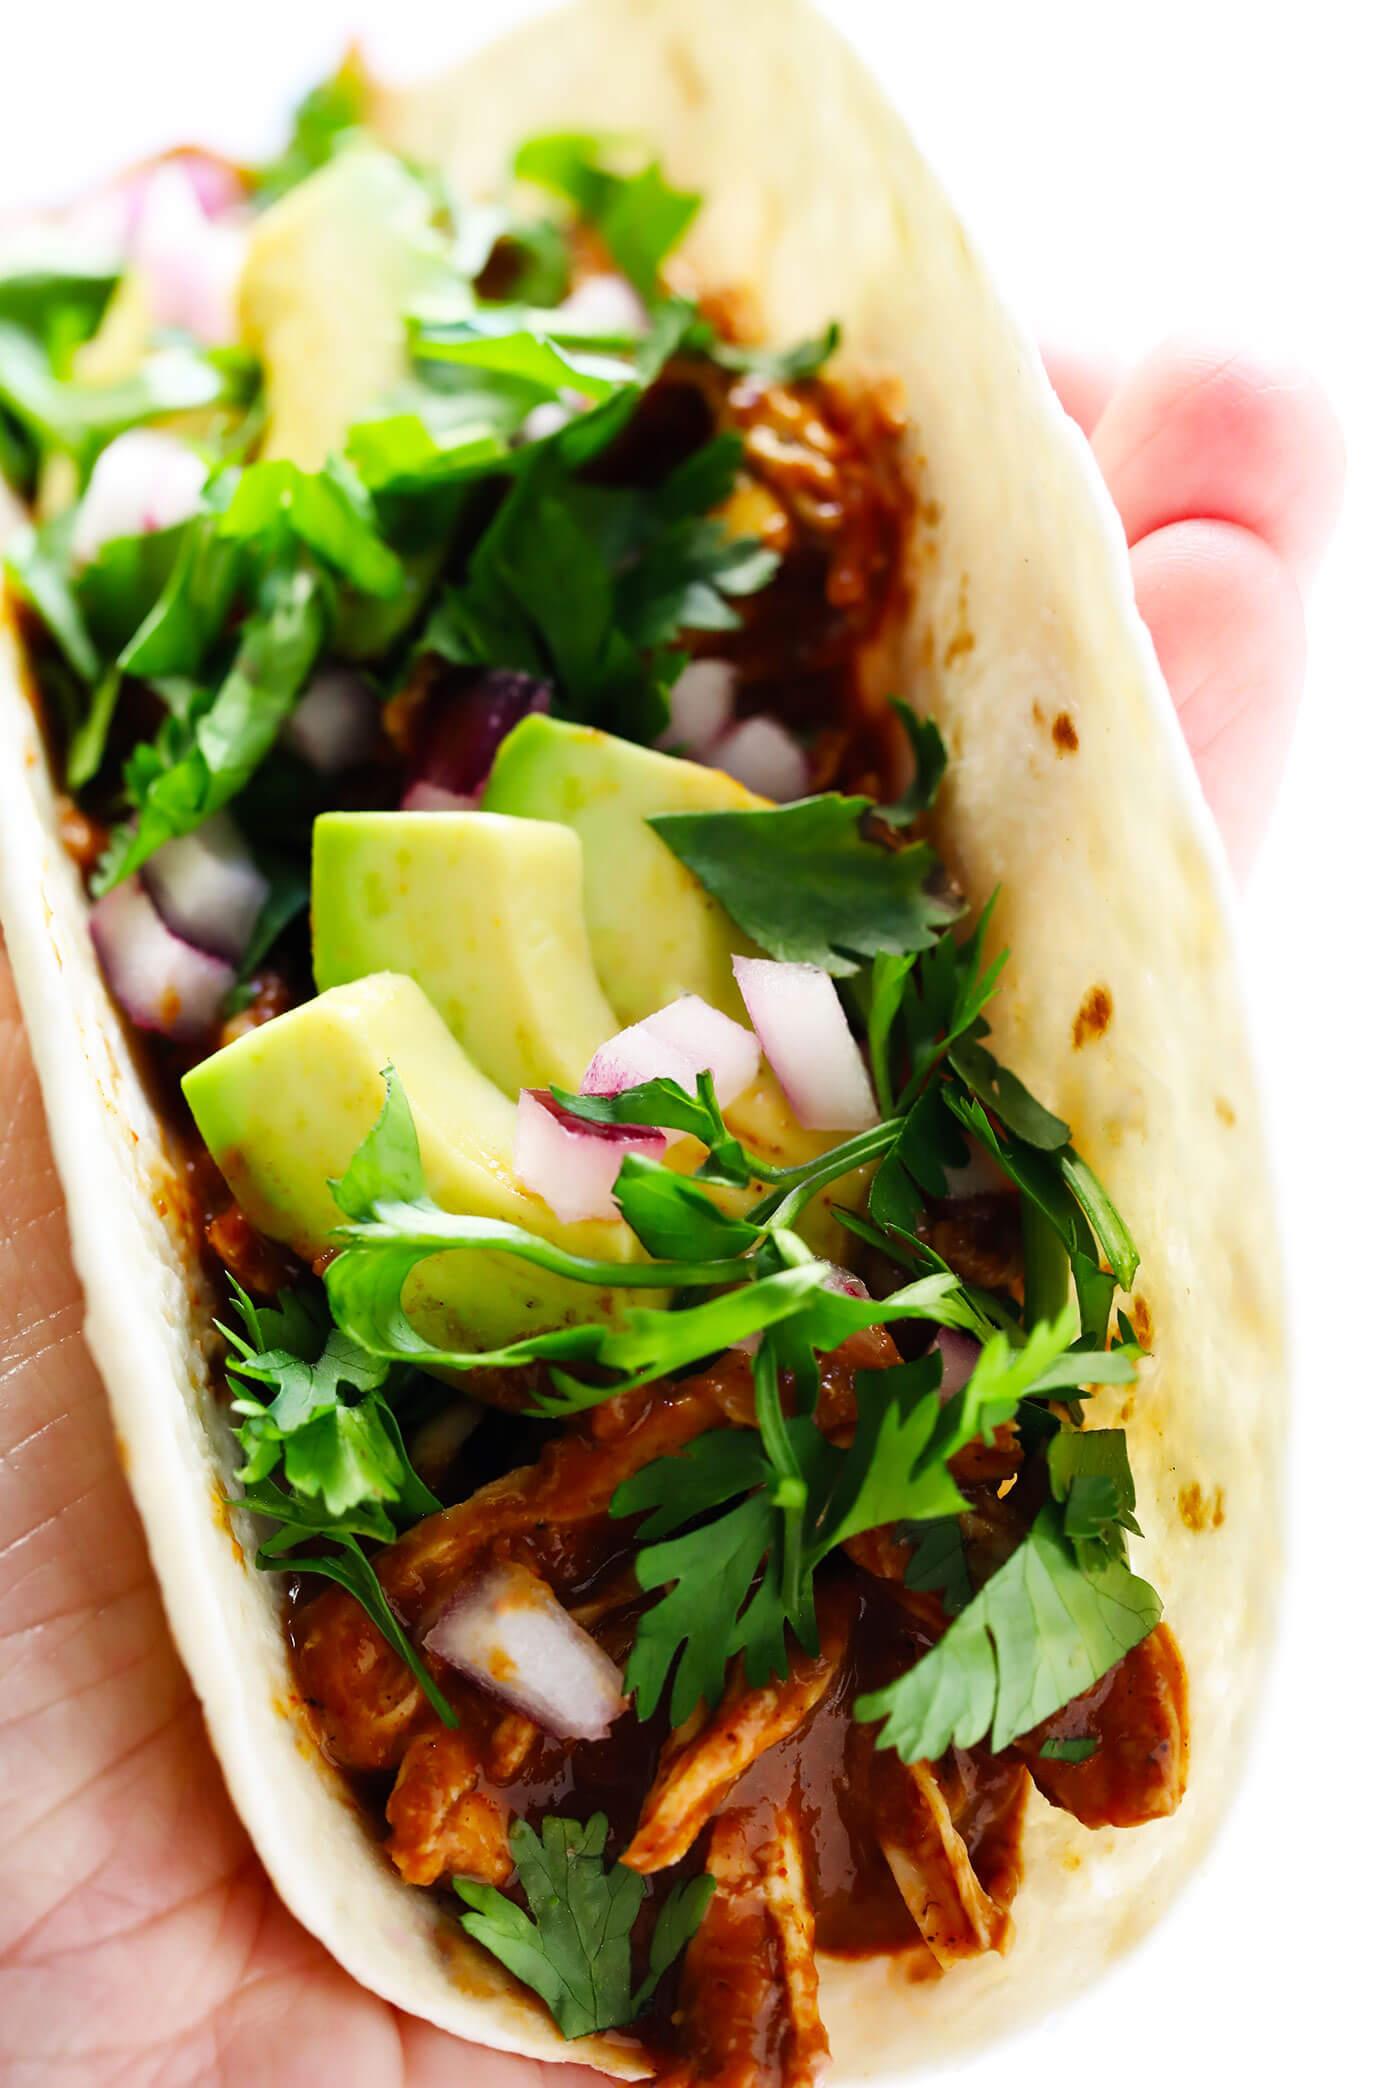 Easy Chicken Tacos with Mole Sauce Recipe